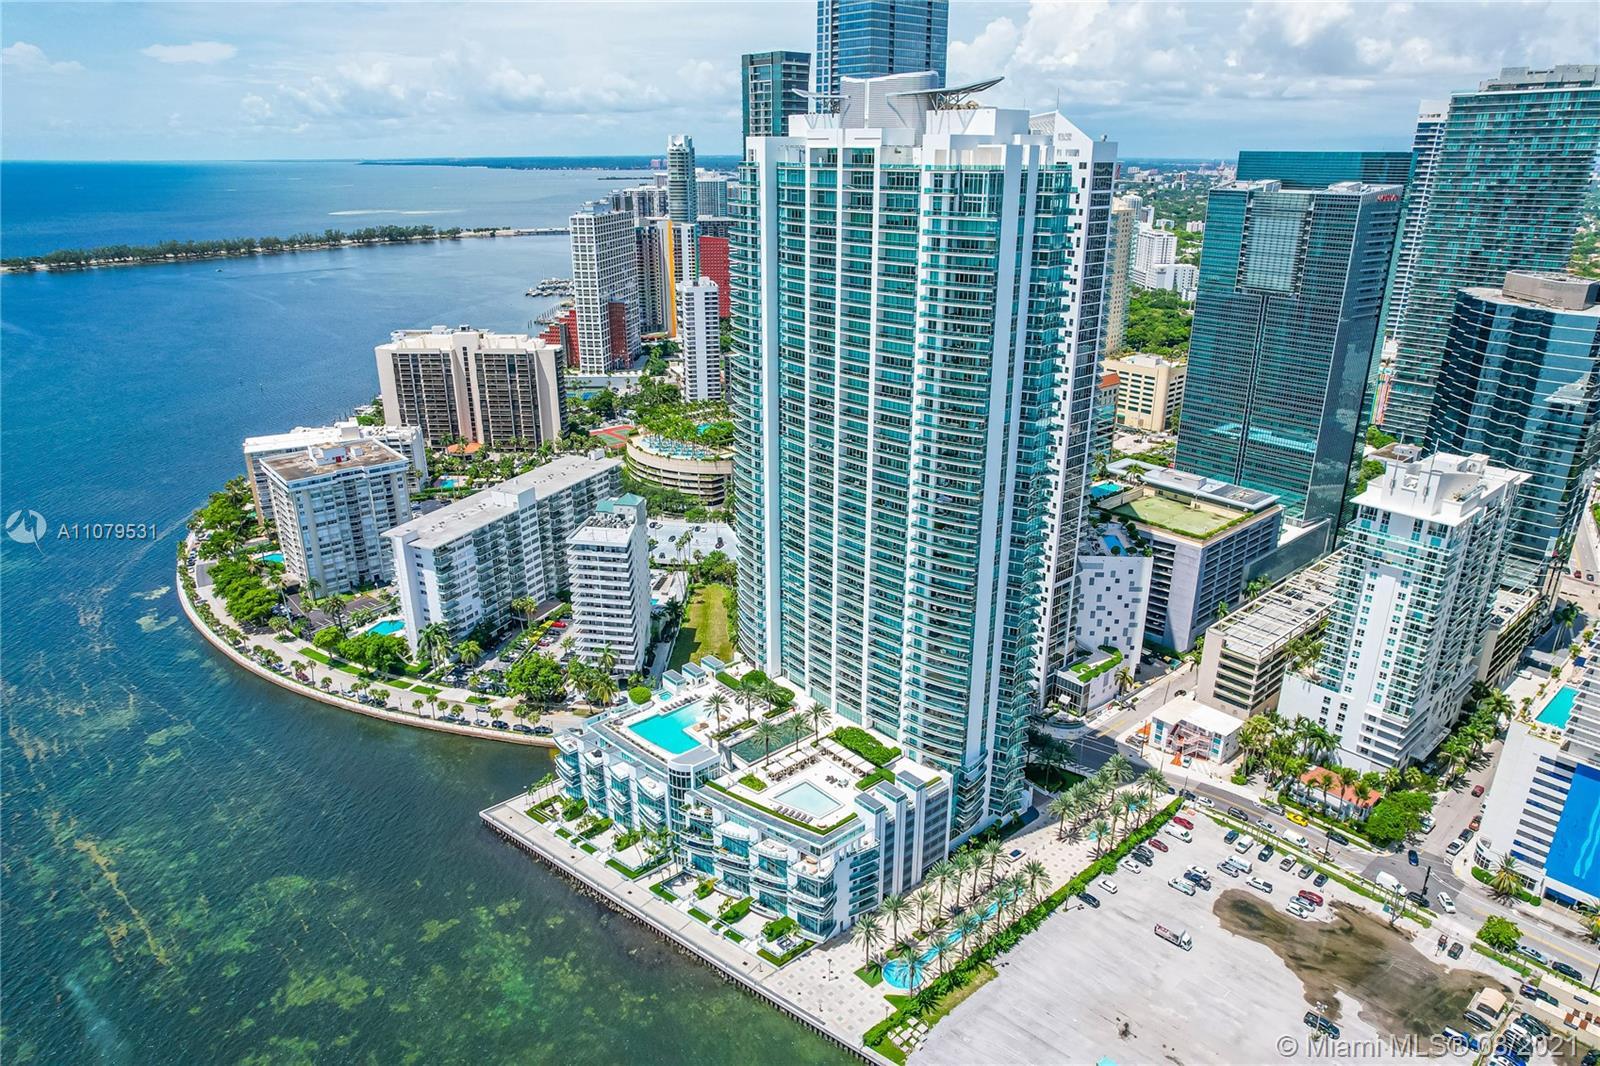 1331 Brickell Bay Dr Unit 3701, Miami, Florida 33131